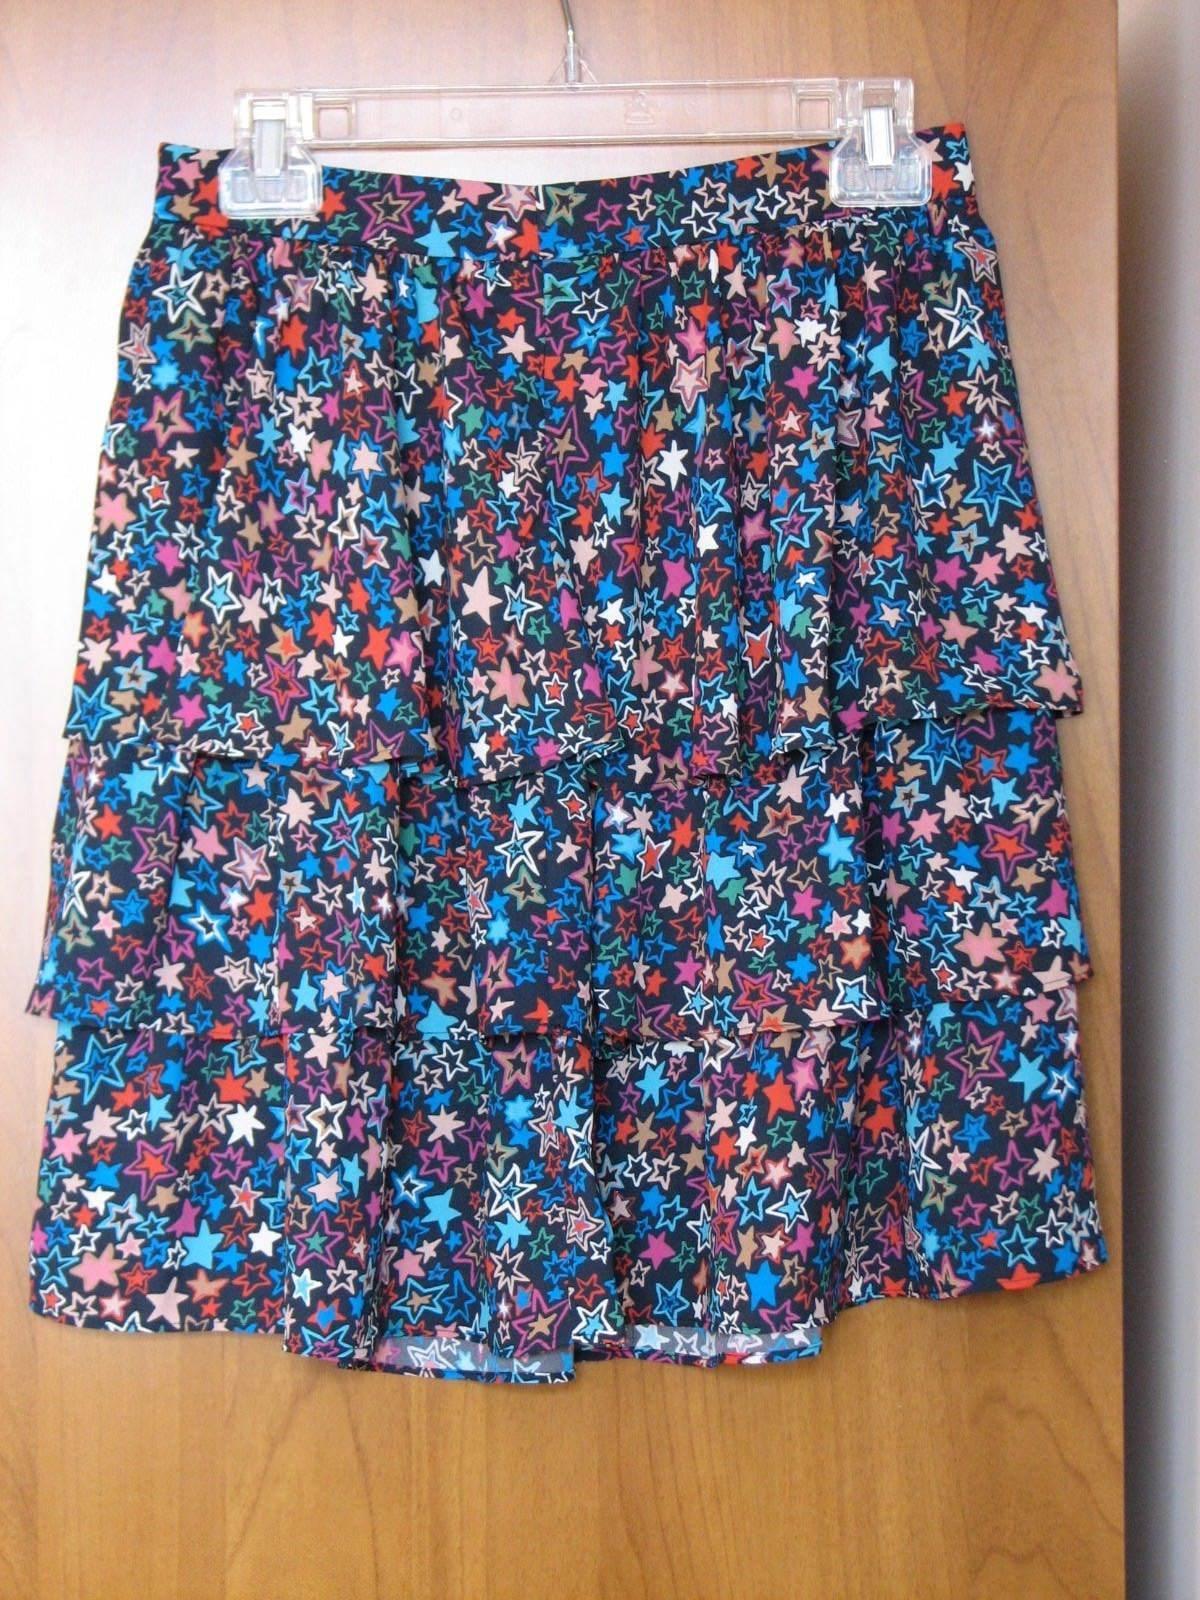 J Crew Women's Tiered Skirt in Kaleidoscope Star Print, H2600, Size 2